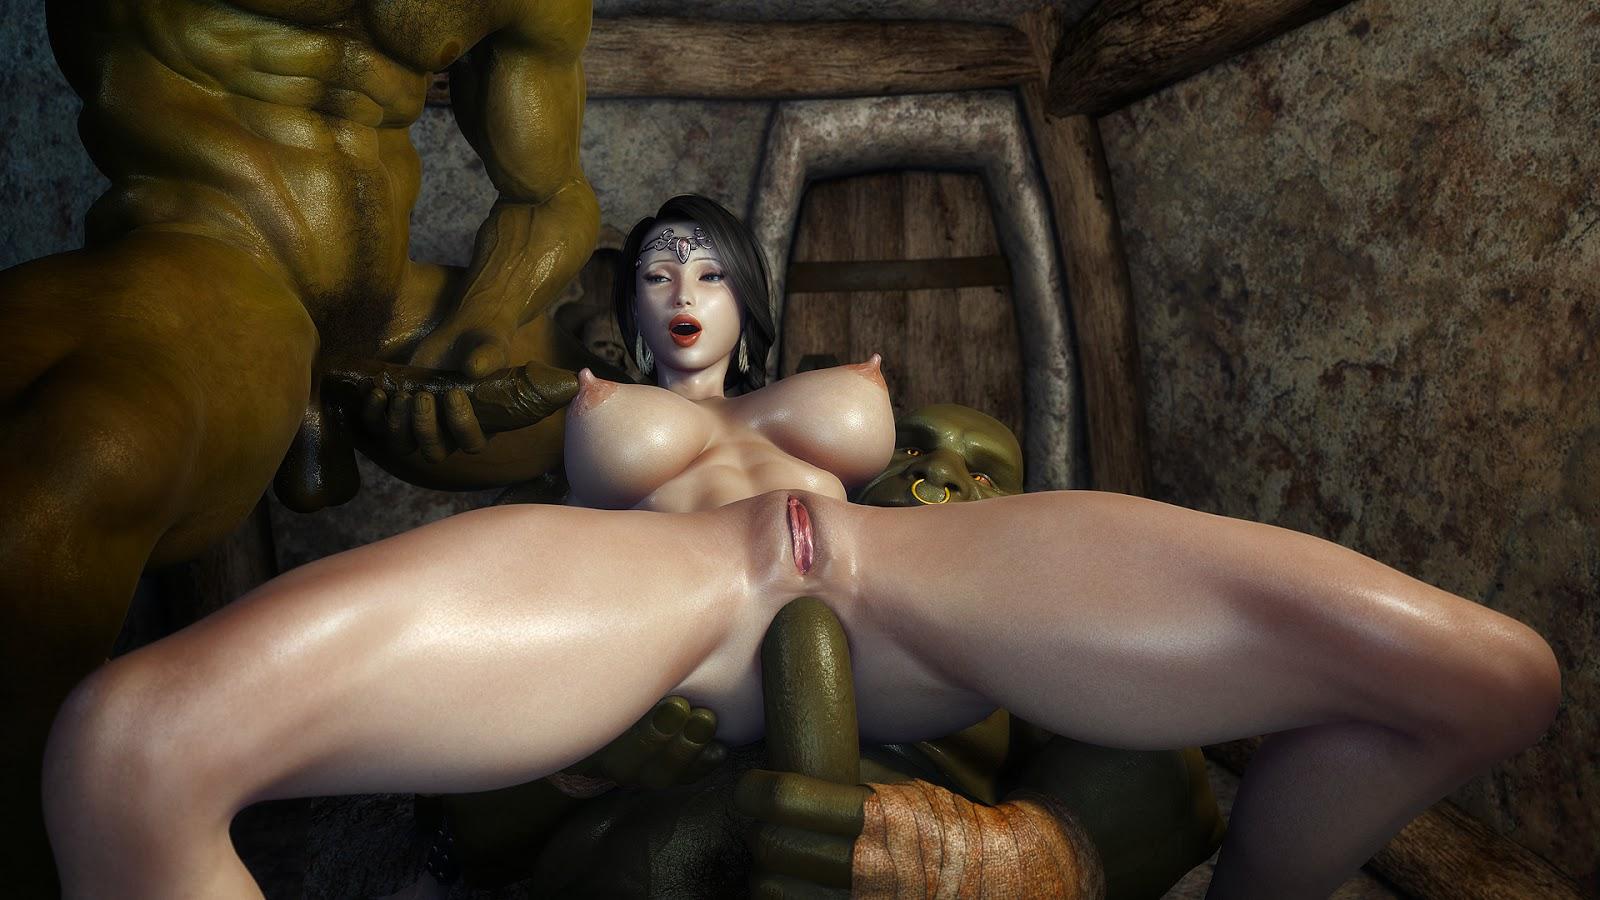 Orcs 3d porn pictures adult photo